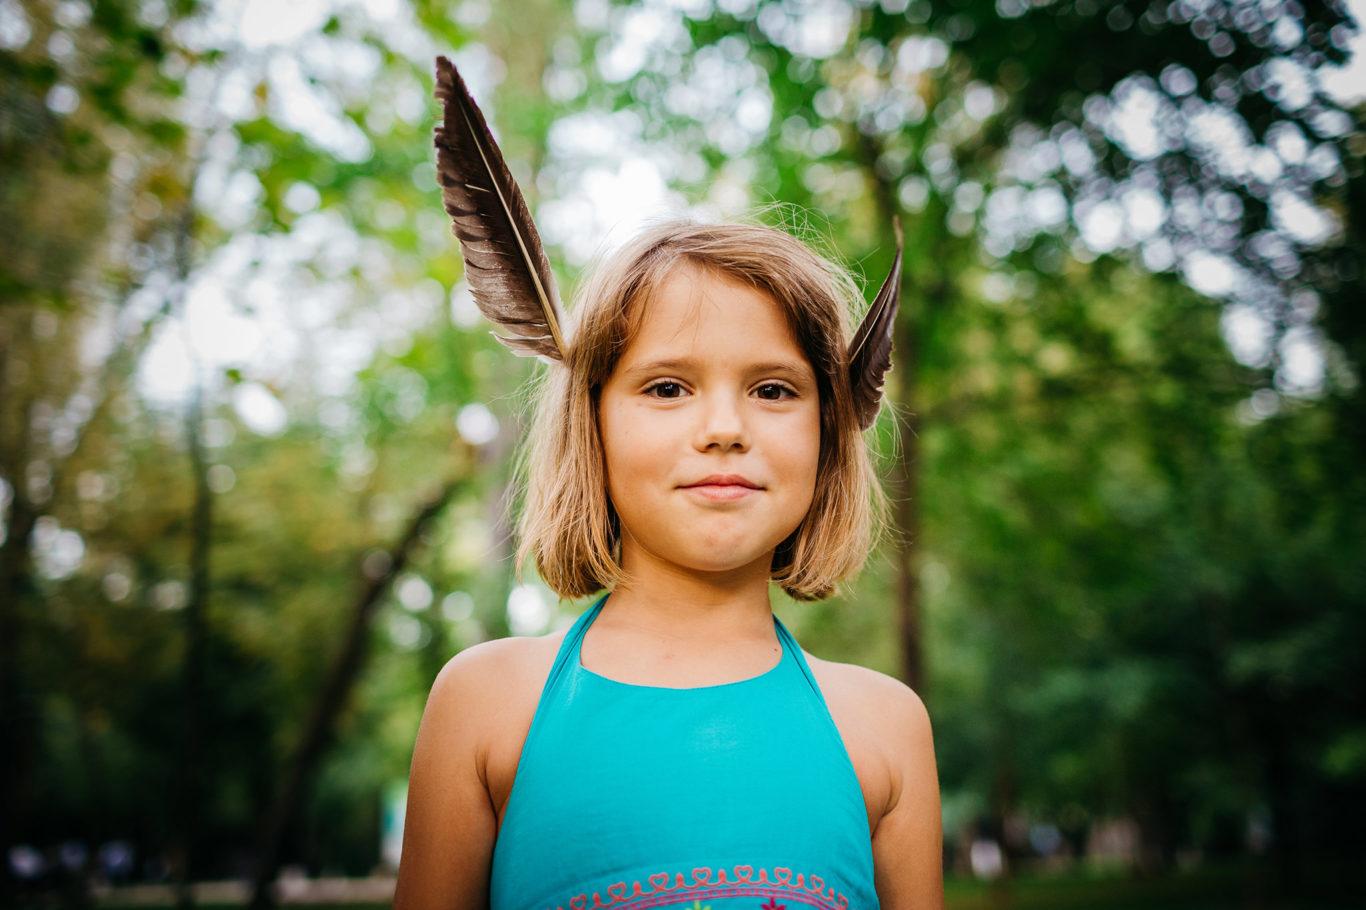 0167-fotografii-familie-ioana-alex-maia-roxi-fotograf-ciprian-dumitrescu-cd2_2185